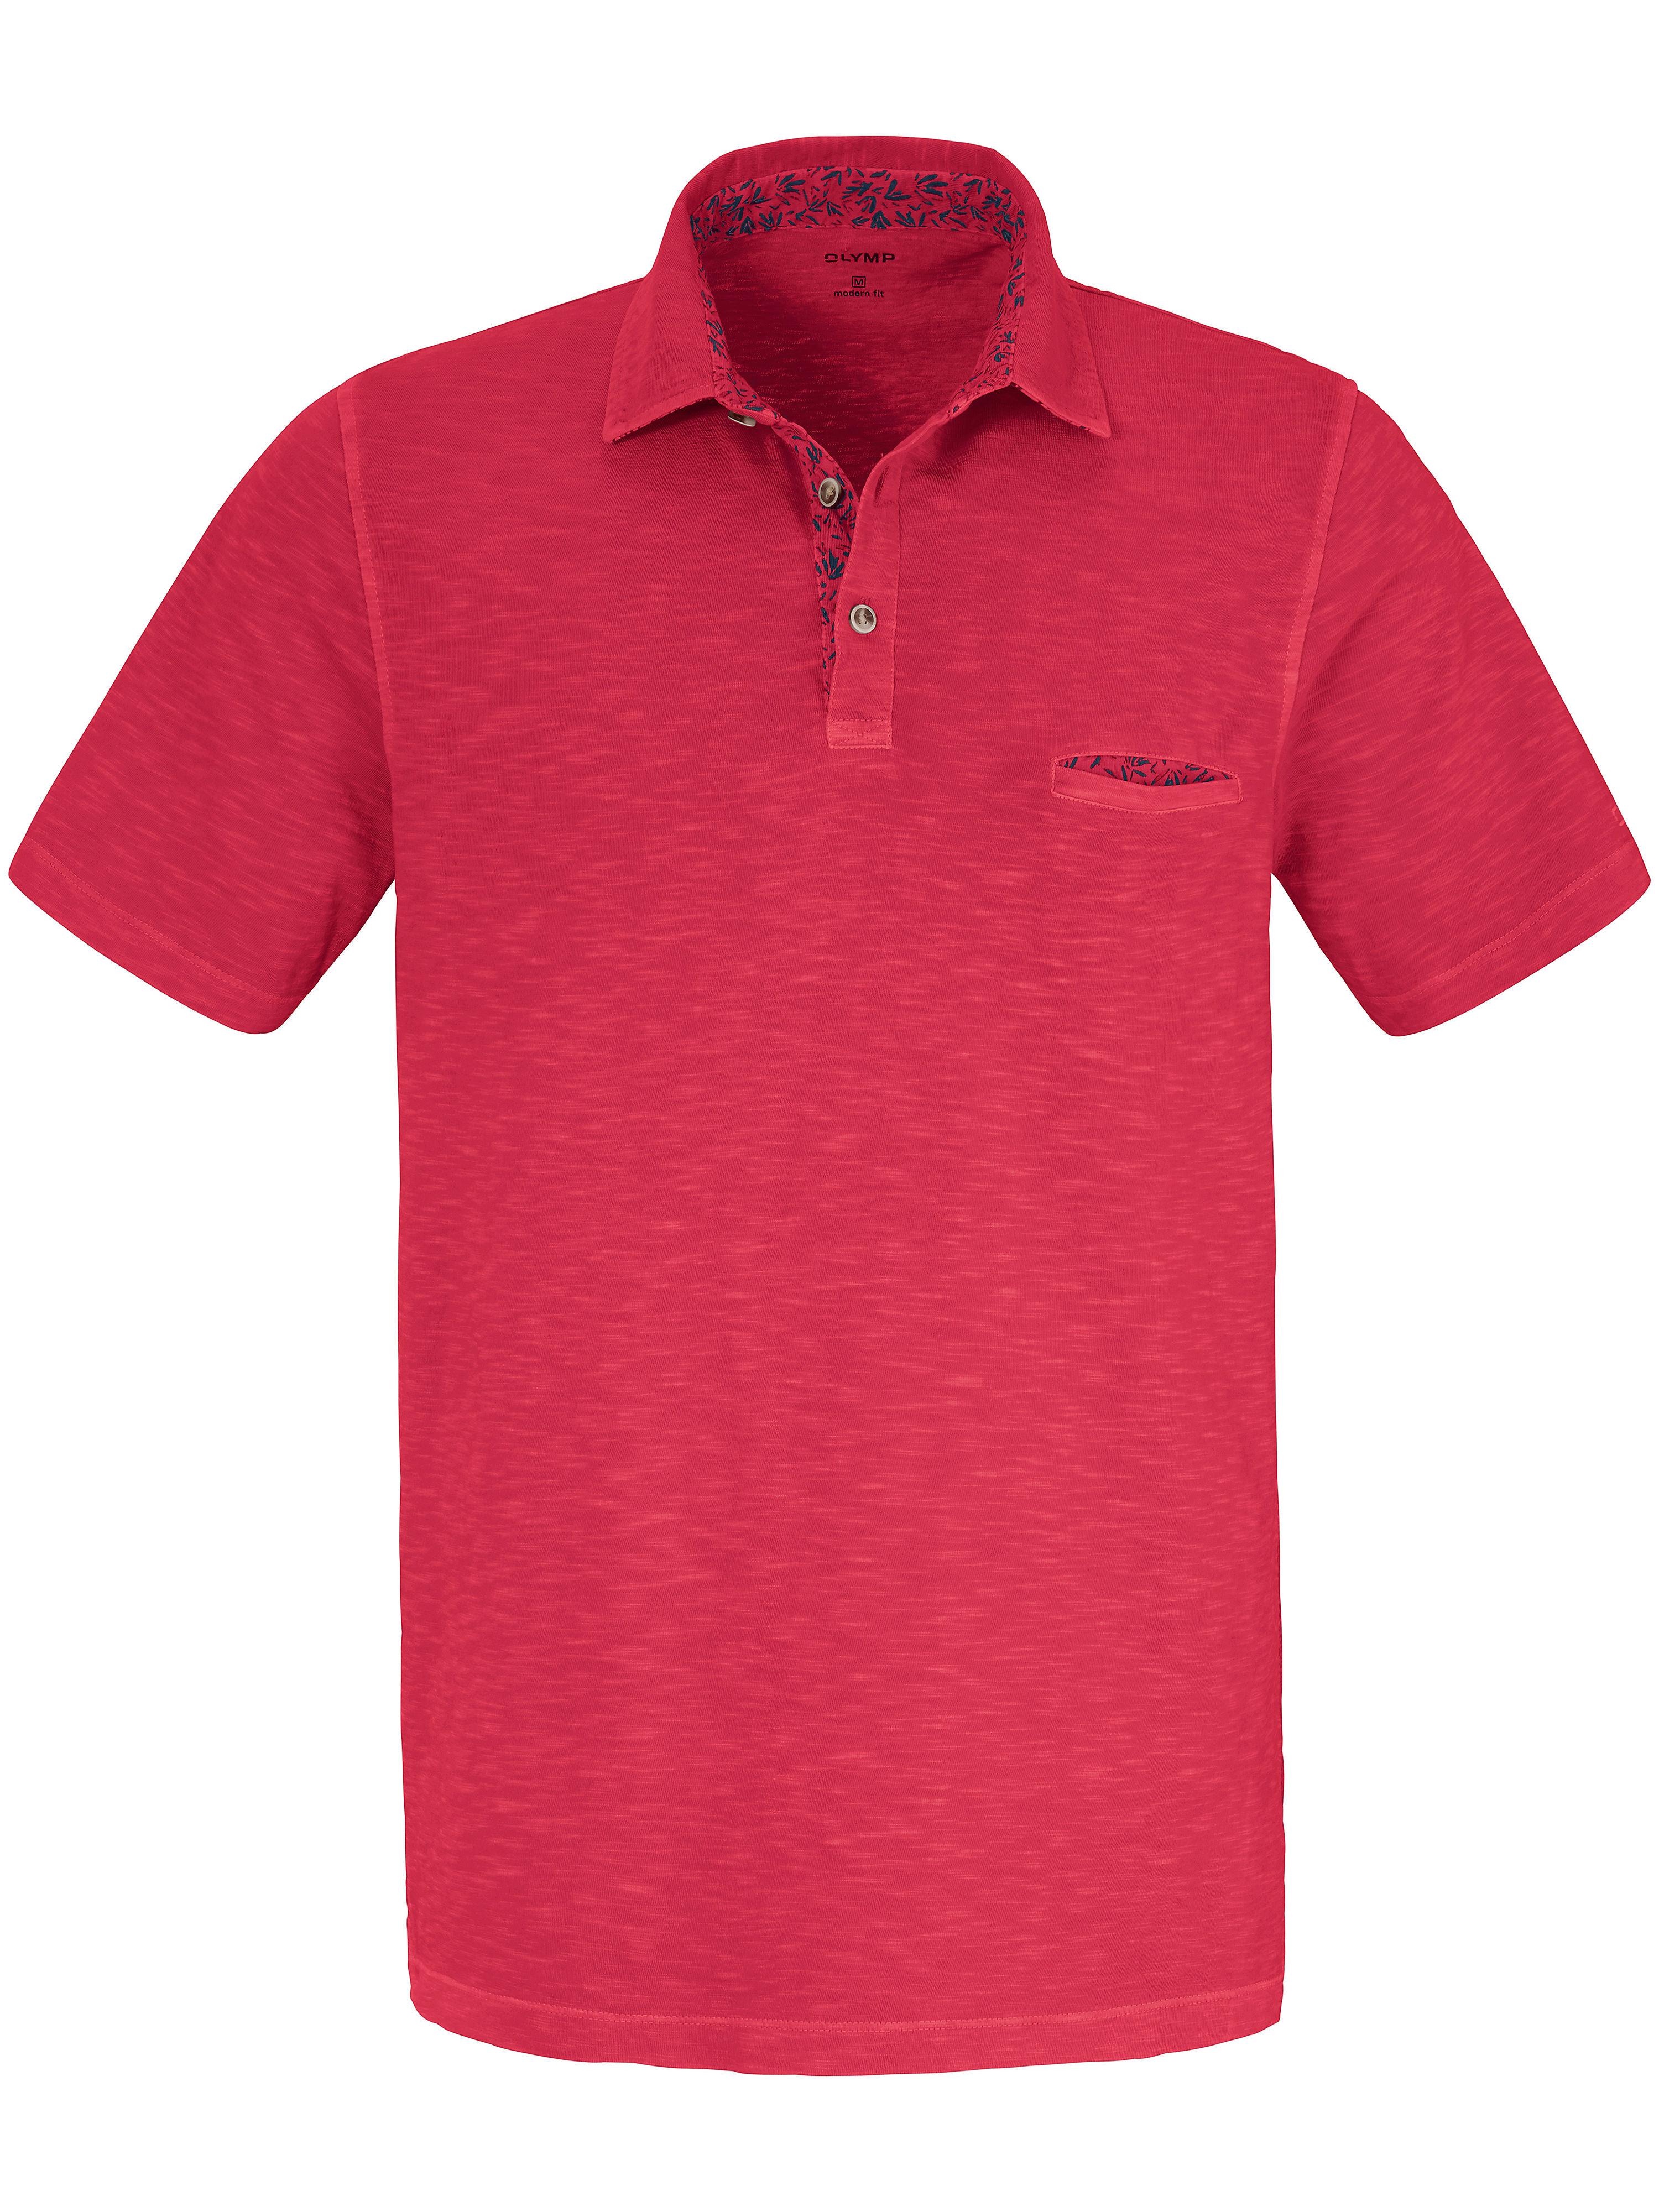 Olymp Polo-Shirt im aktuellen Washer Look Olymp rot